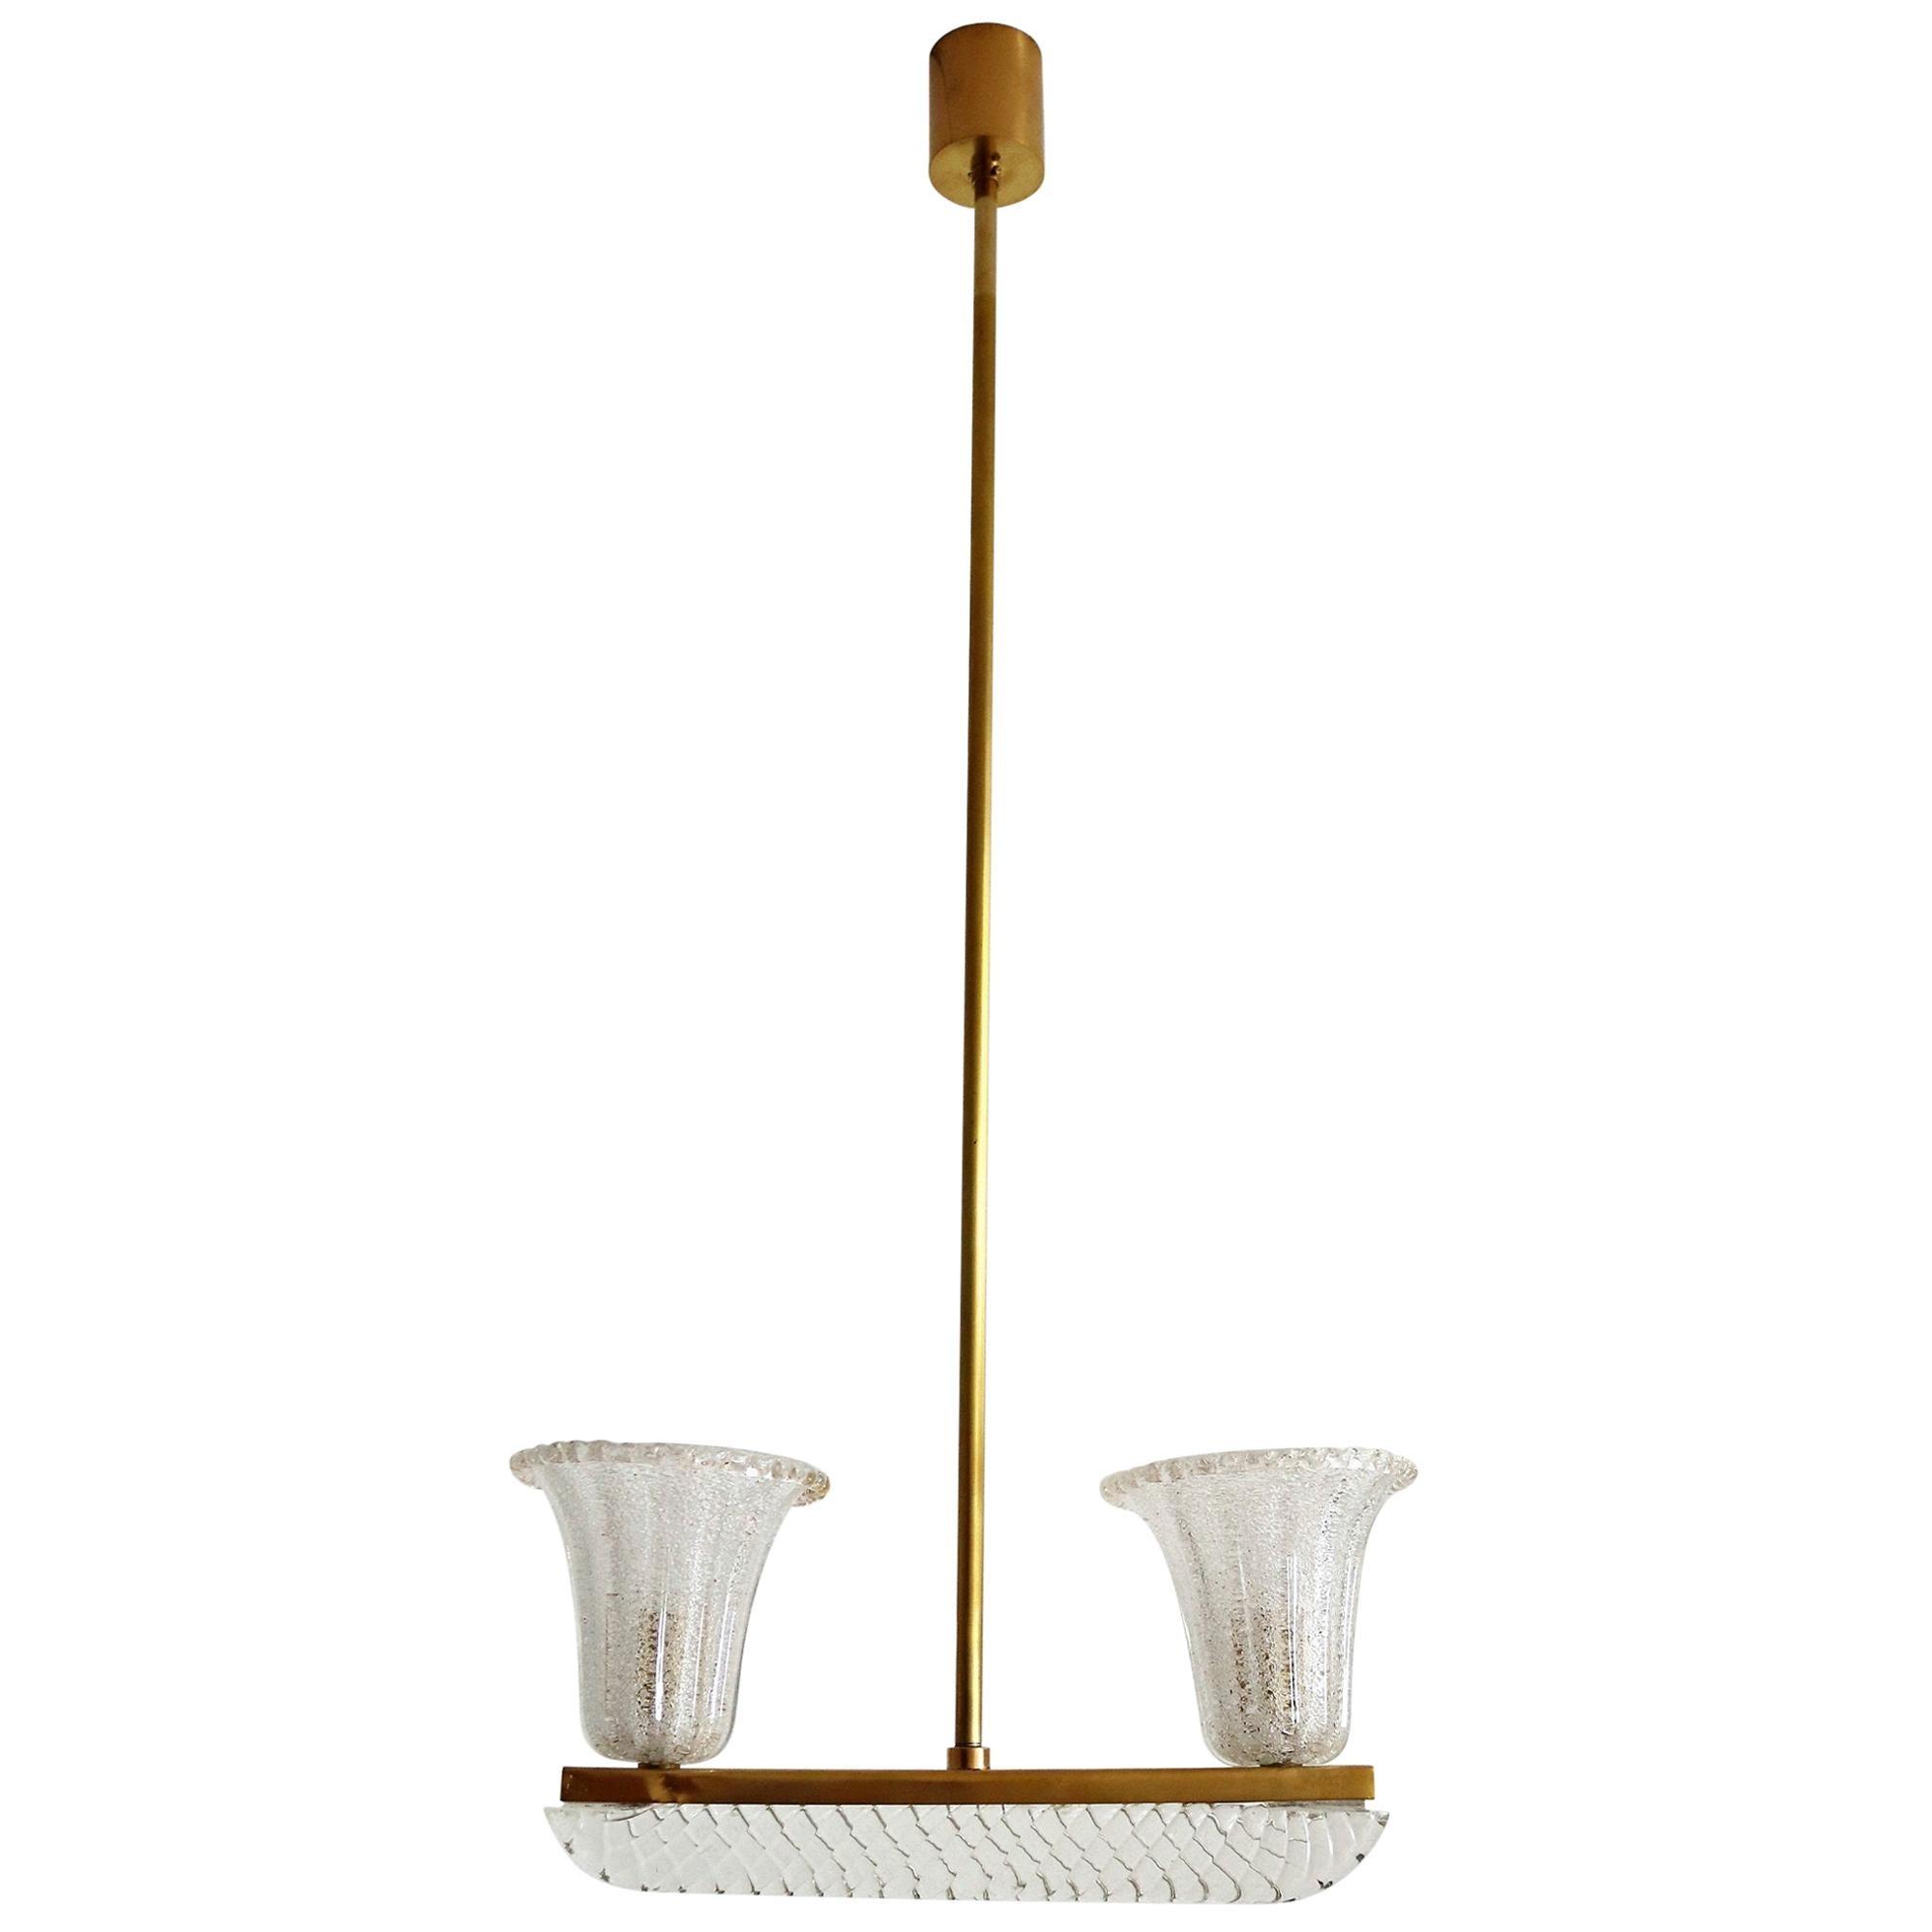 Italian Art Deco Murano Glass and Brass Pendant Light by Barovier & Toso, 1940s